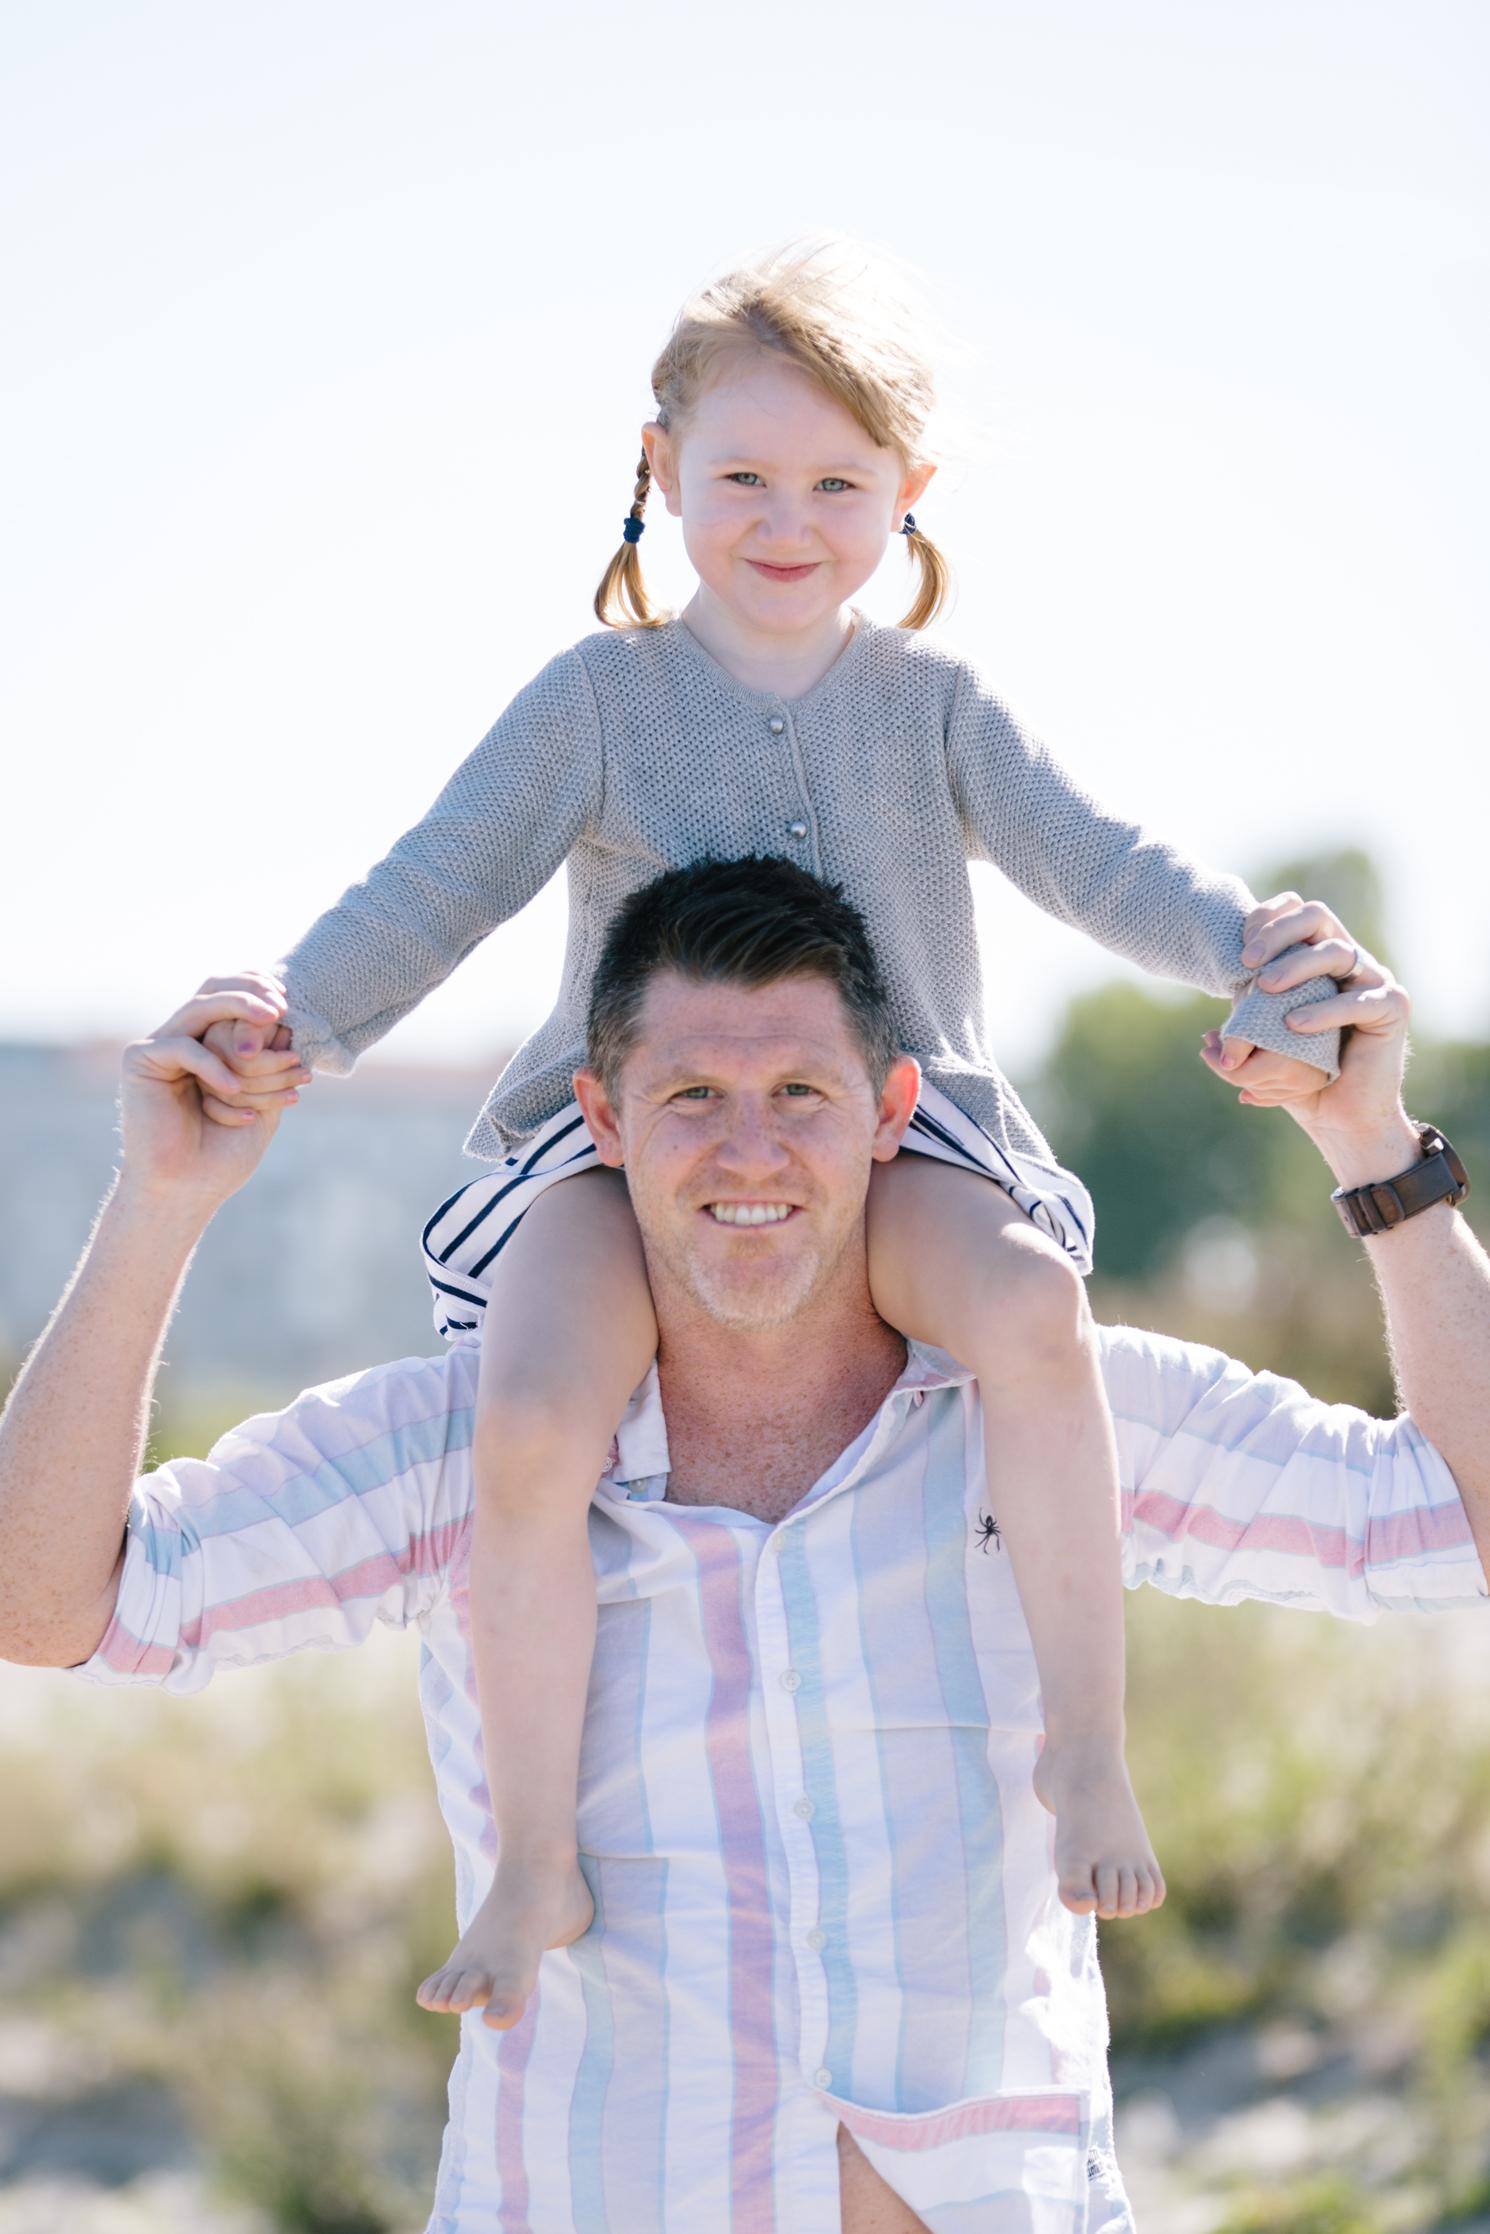 familjefotografering-malmo-kallbadhuset-maria-o-photo-lek-gladje-karlek-10